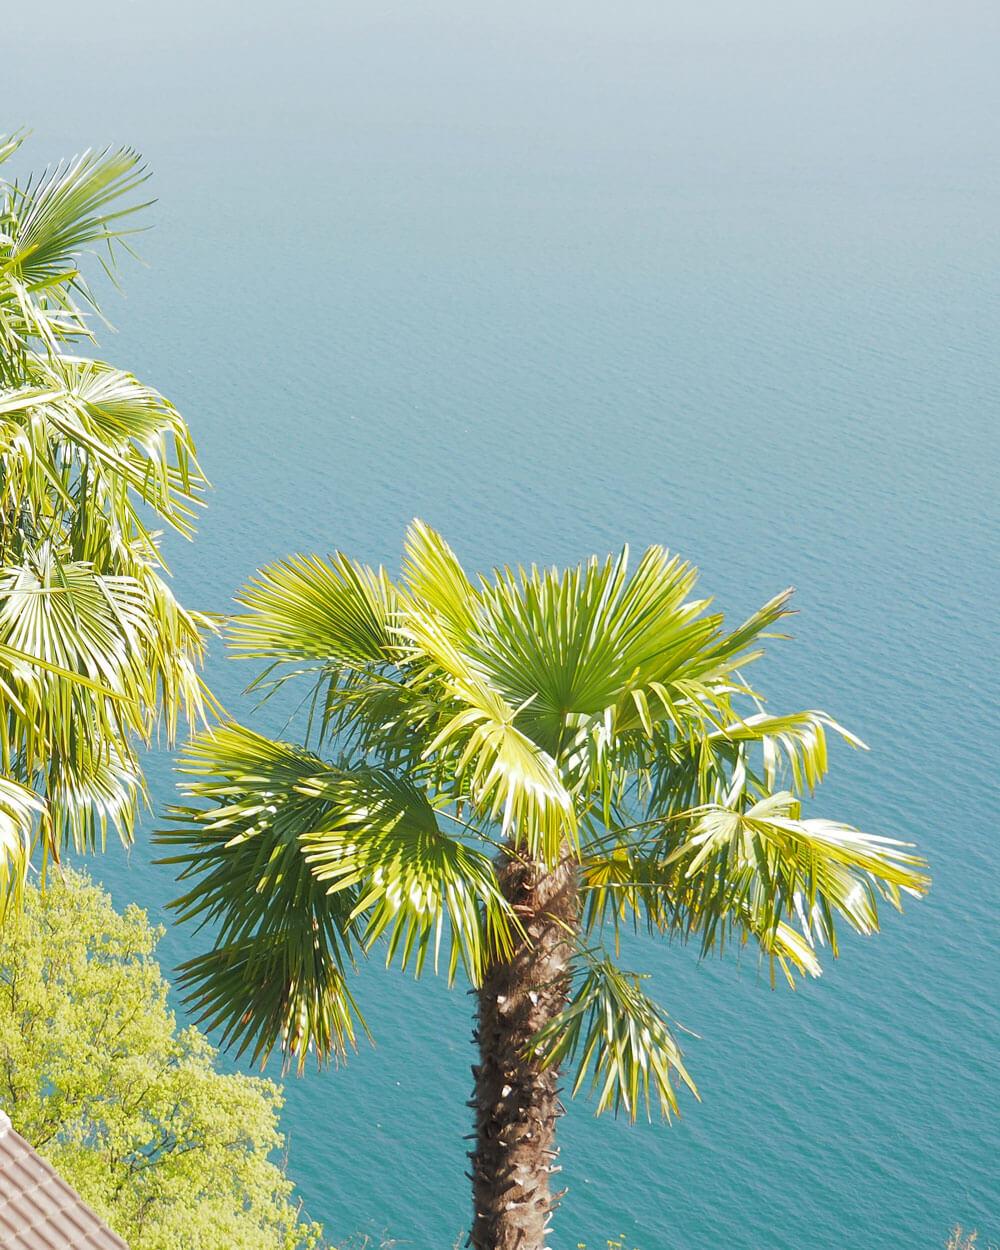 Ticino Palm Trees